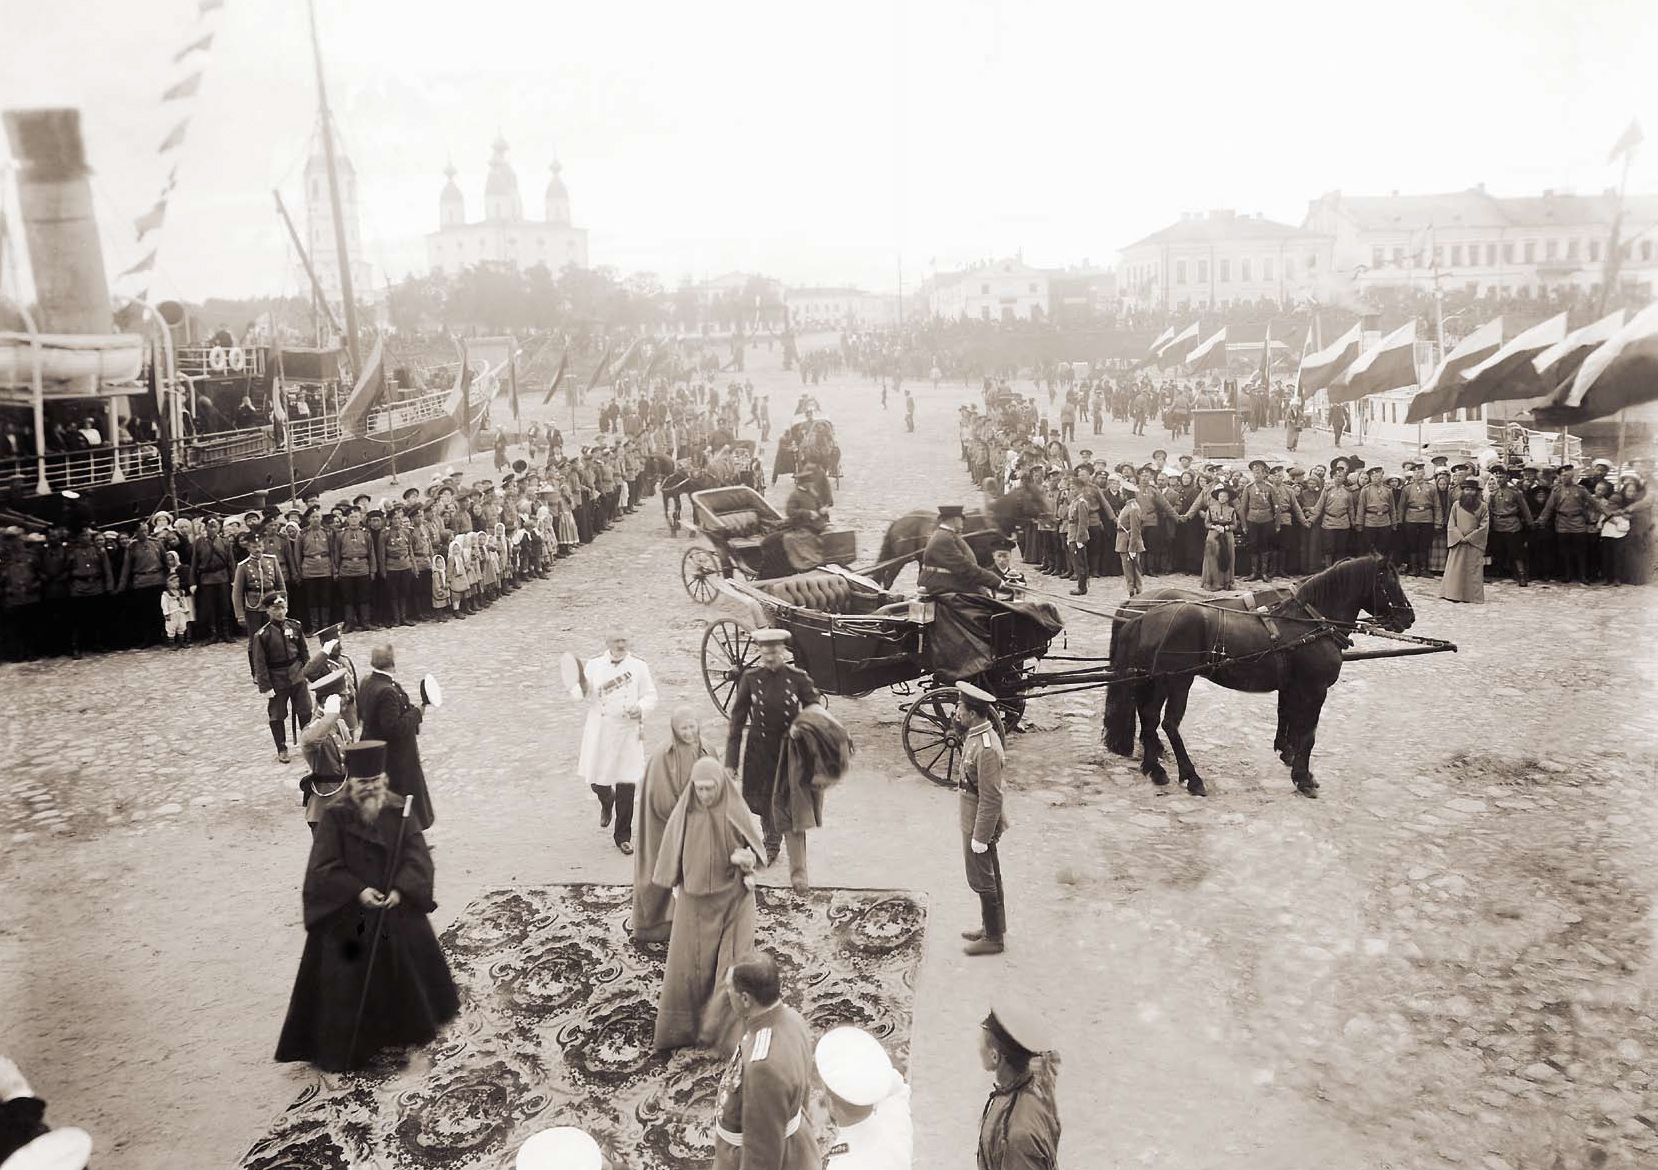 Великая княгиня Елизавета Федоровна на Соборной пристани. 1913